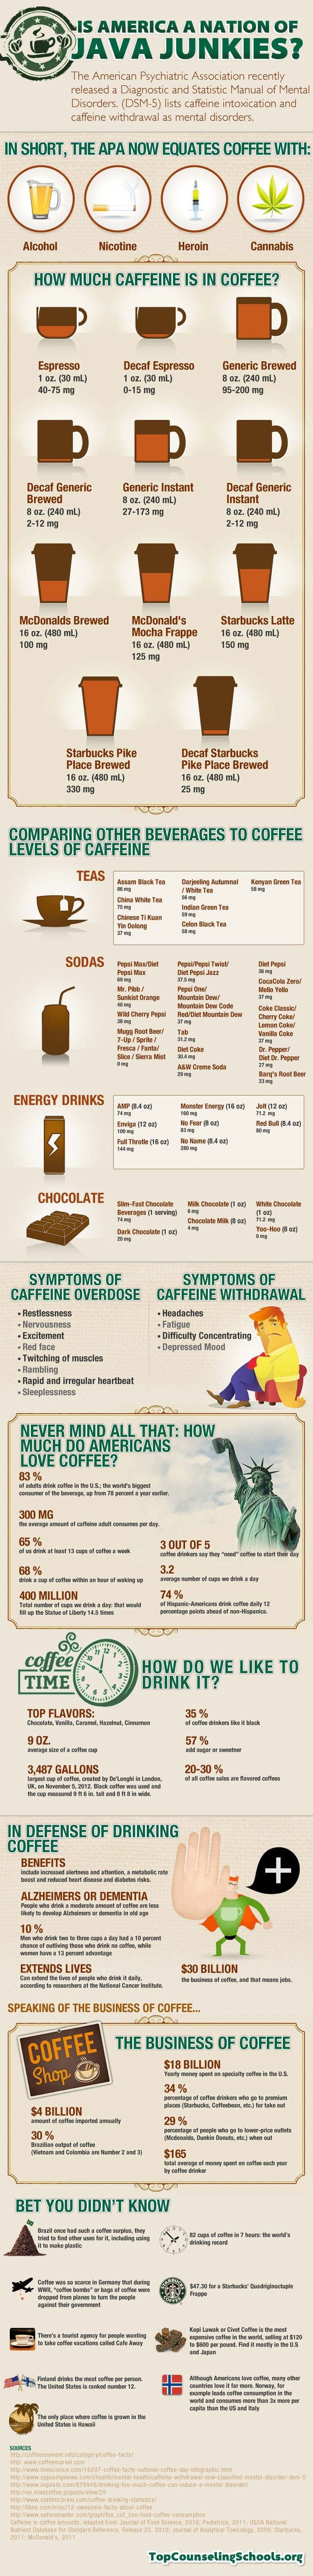 #INFOgraphic > Caffeine Addiction USA:   > http://infographicsmania.com/caffeine-addiction-usa/?utm_source=Pinterest&utm_medium=INFOGRAPHICSMANIA&utm_campaign=SNAP